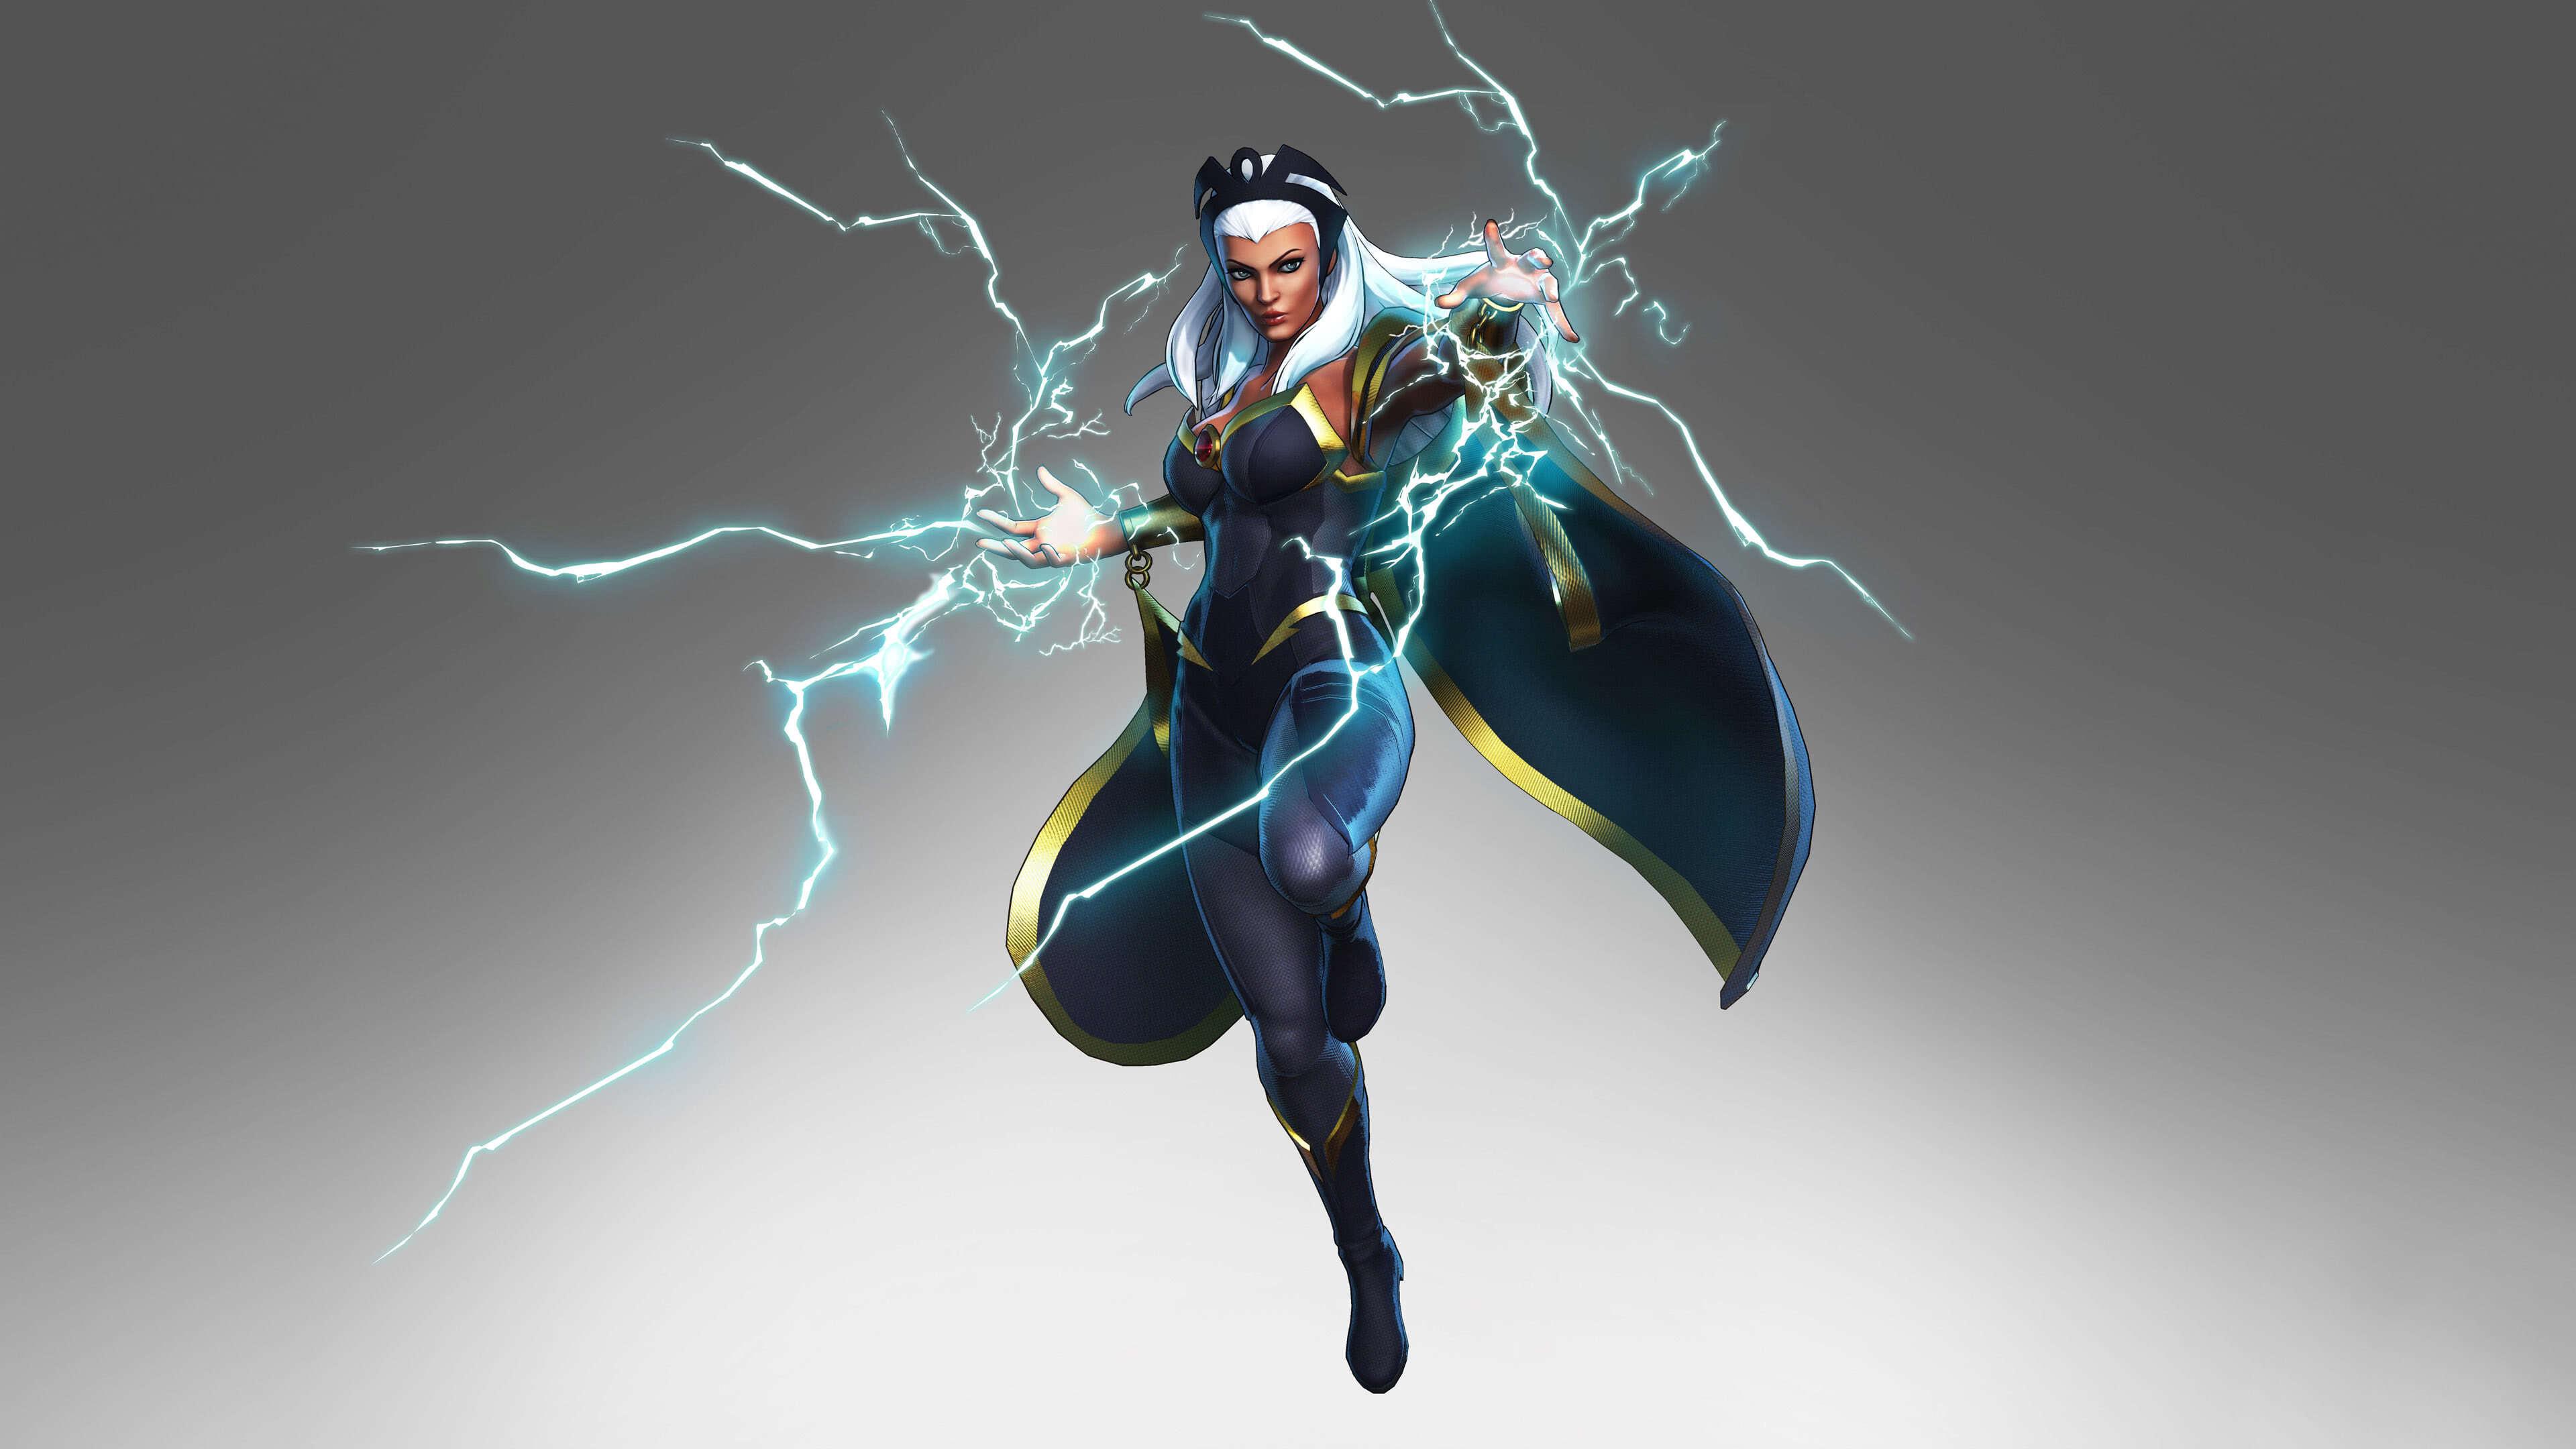 marvel ultimate alliance 3 storm lightning uhd 4k wallpaper